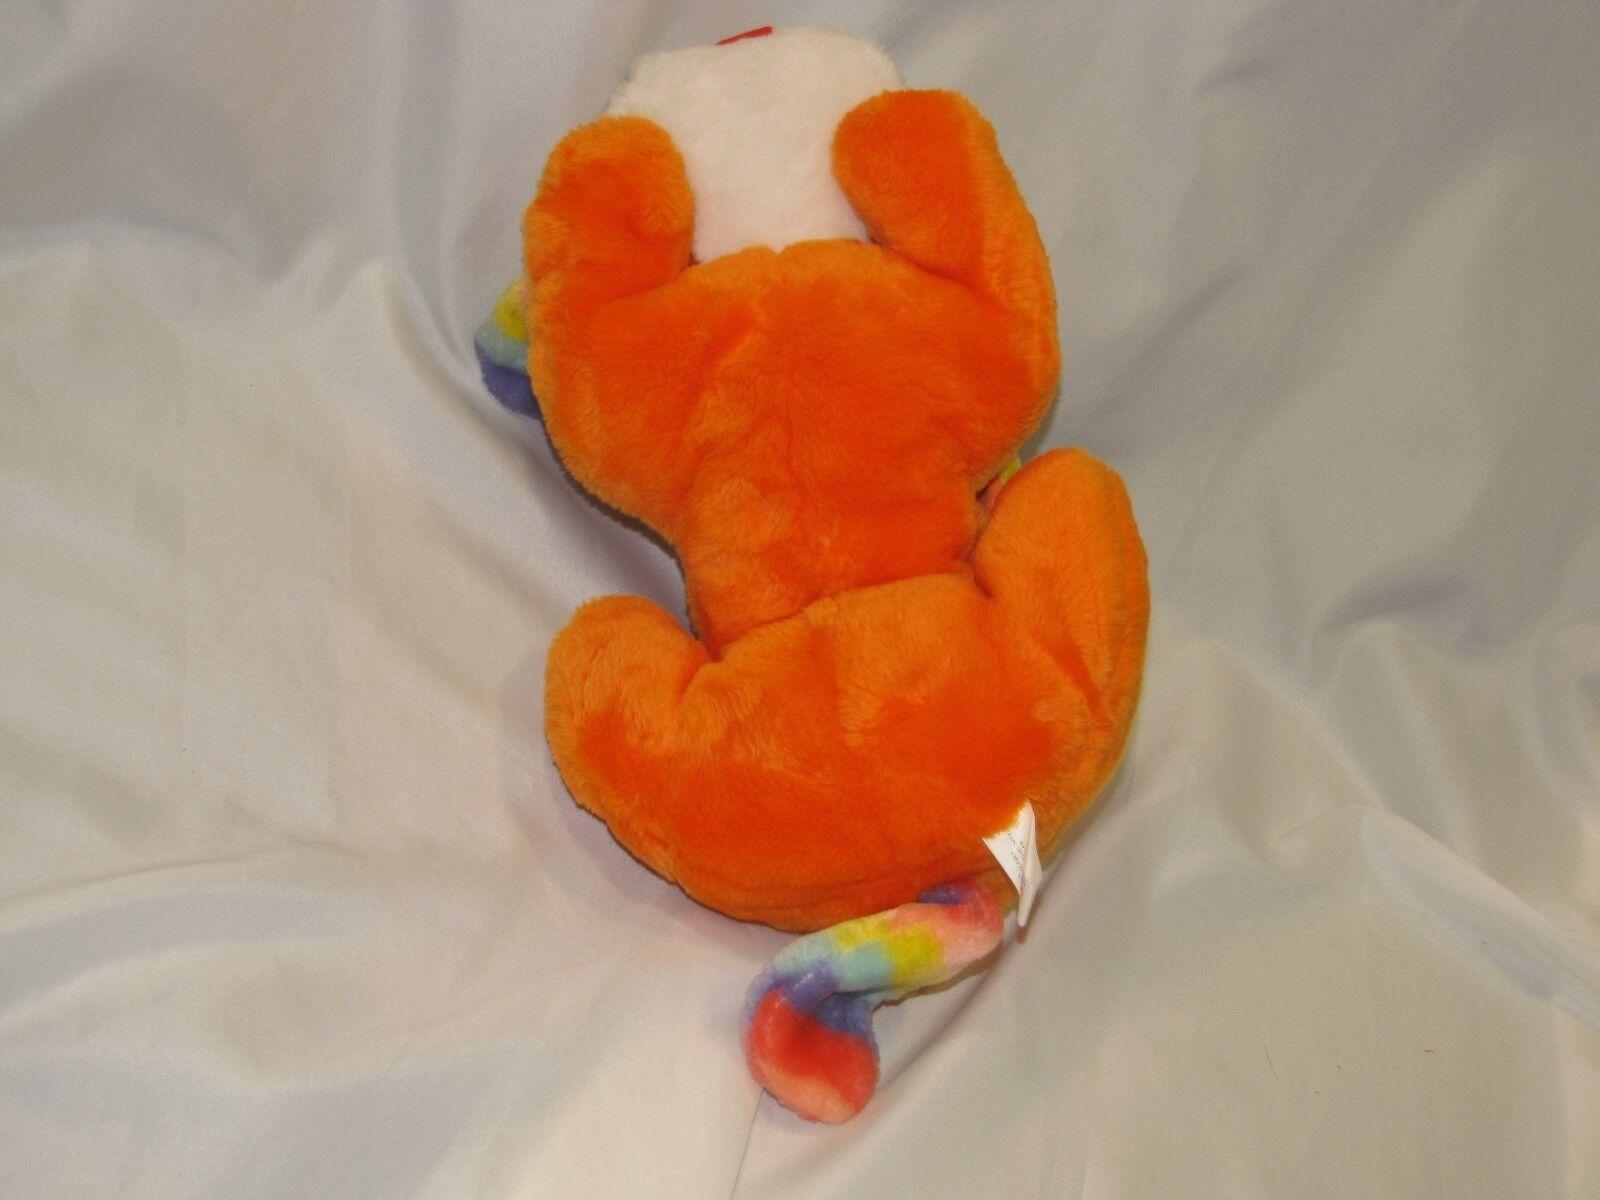 VTG THE PLUSH FACTORY orange RAINBOW STRIPE EAR STUFFED STUFFED STUFFED PUPPY DOG 14  19  ce7cff